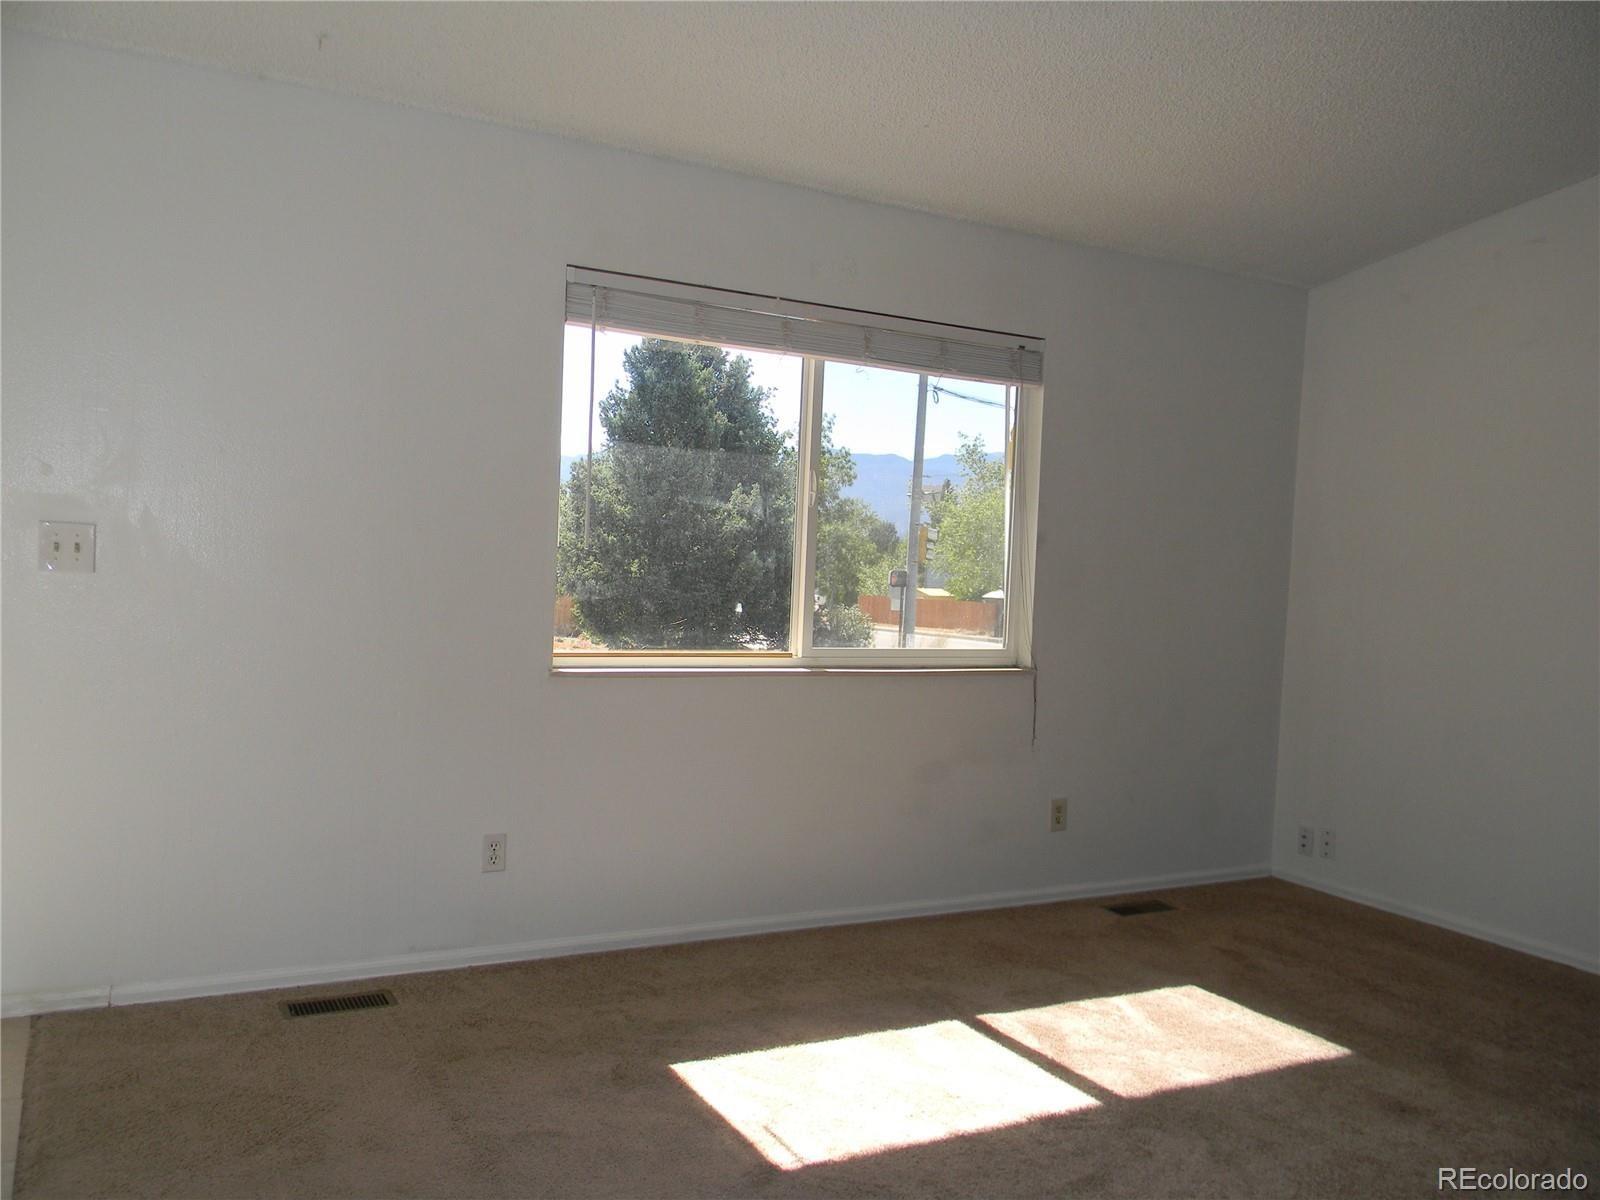 MLS# 5946356 - 5 - 4920 Ridenour Drive, Colorado Springs, CO 80916